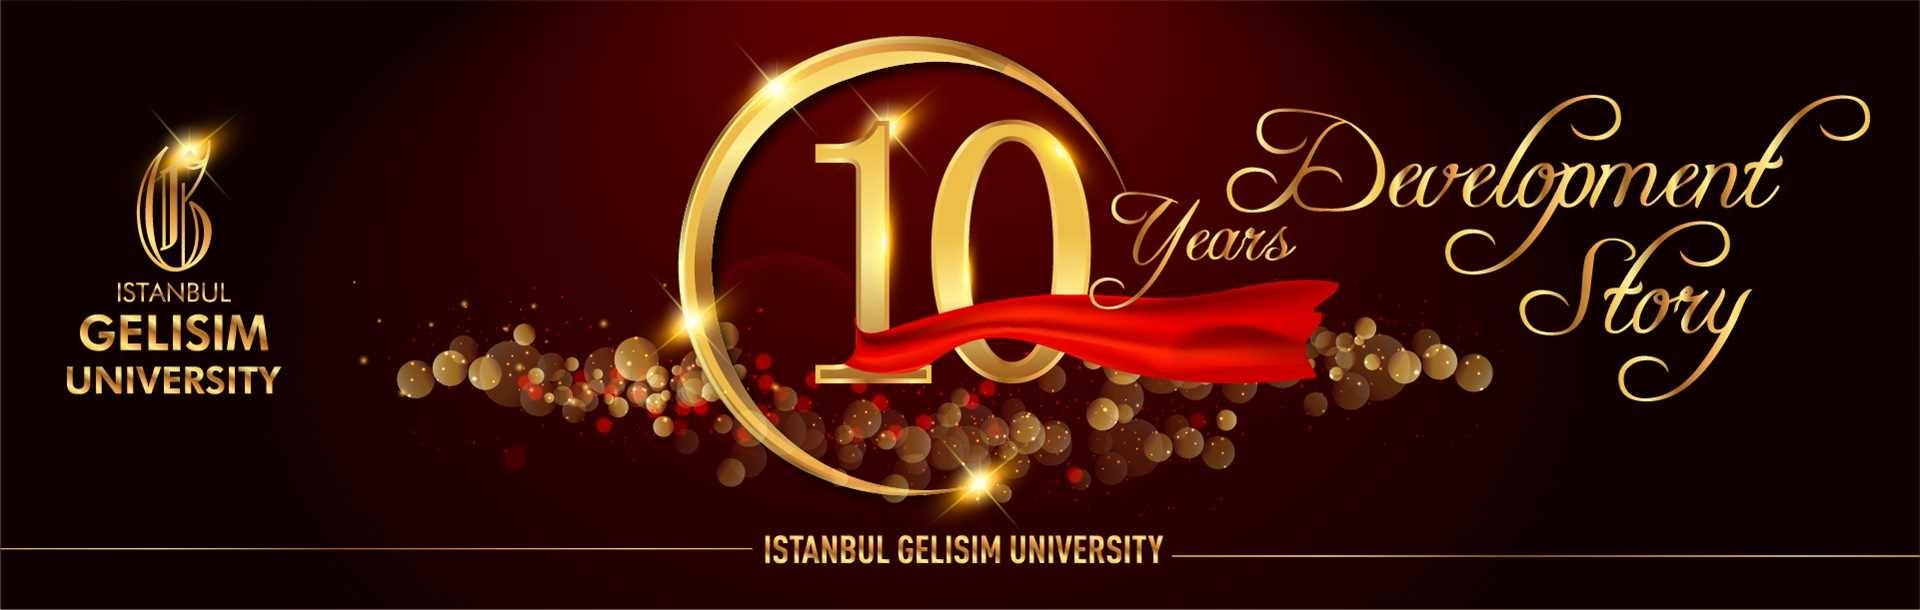 Istanbul Gelisim University - 10 Years Development Story